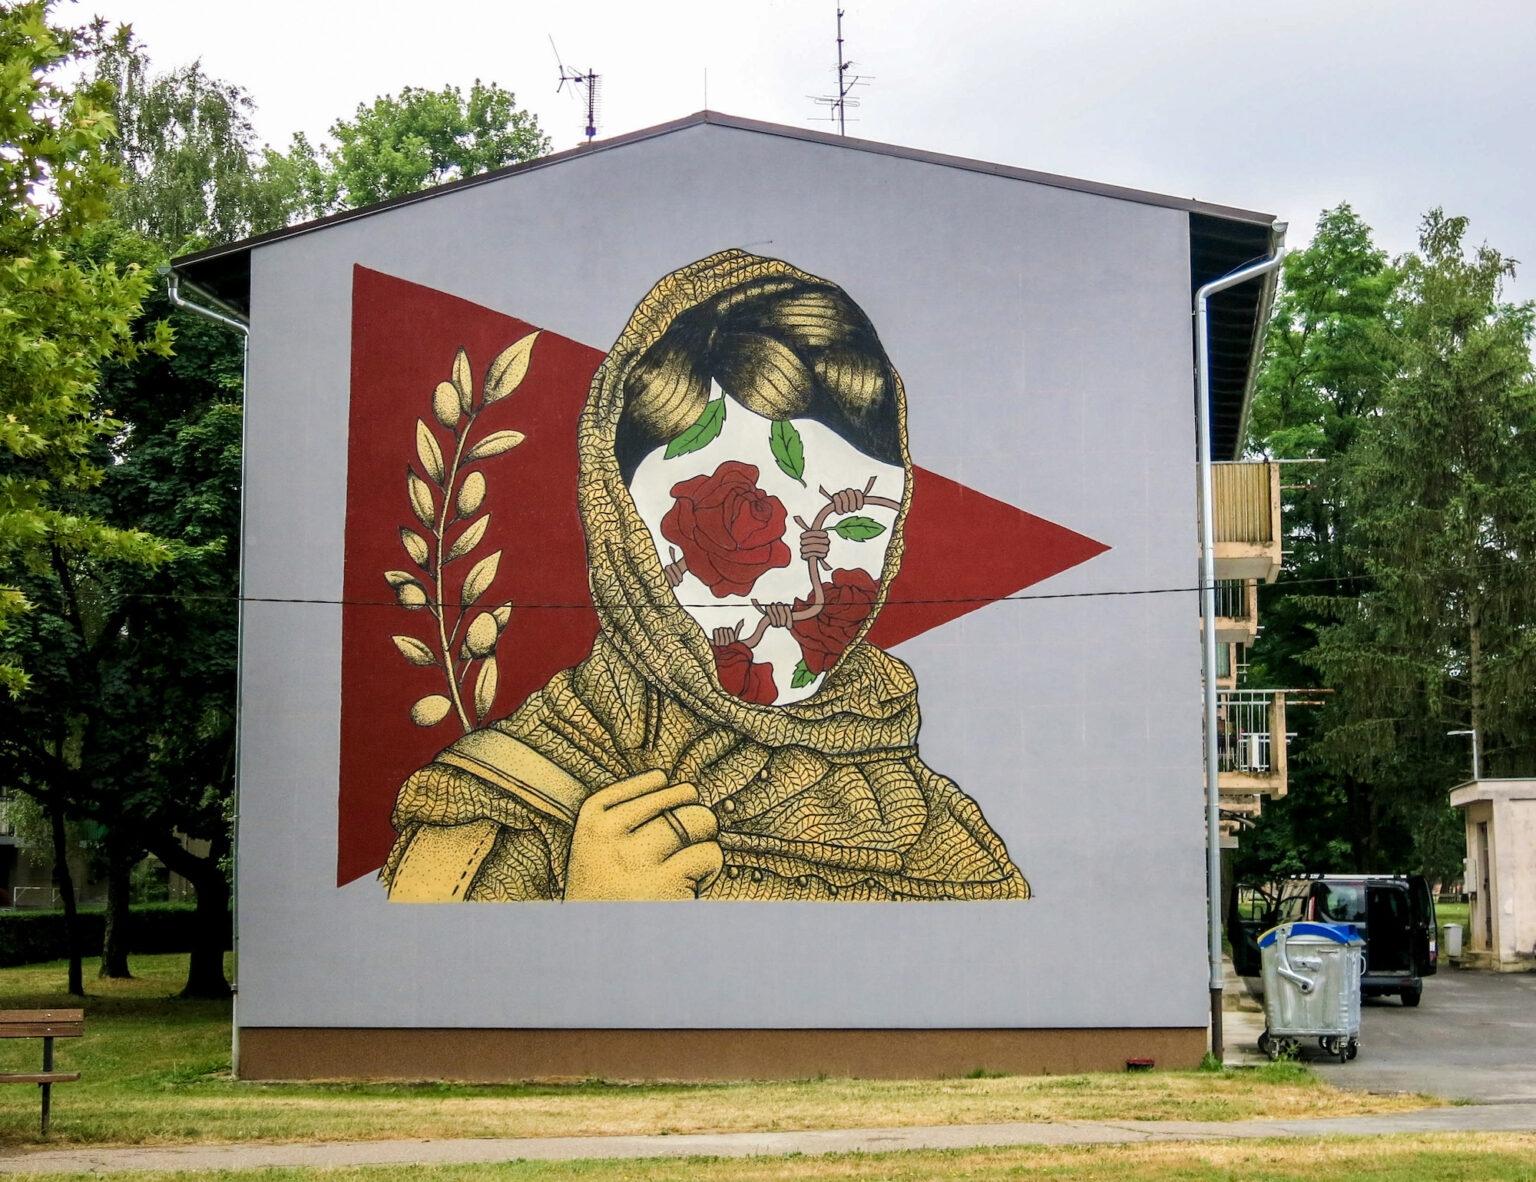 Mural by PoliteBastART in Sisak, Republic of Croatia